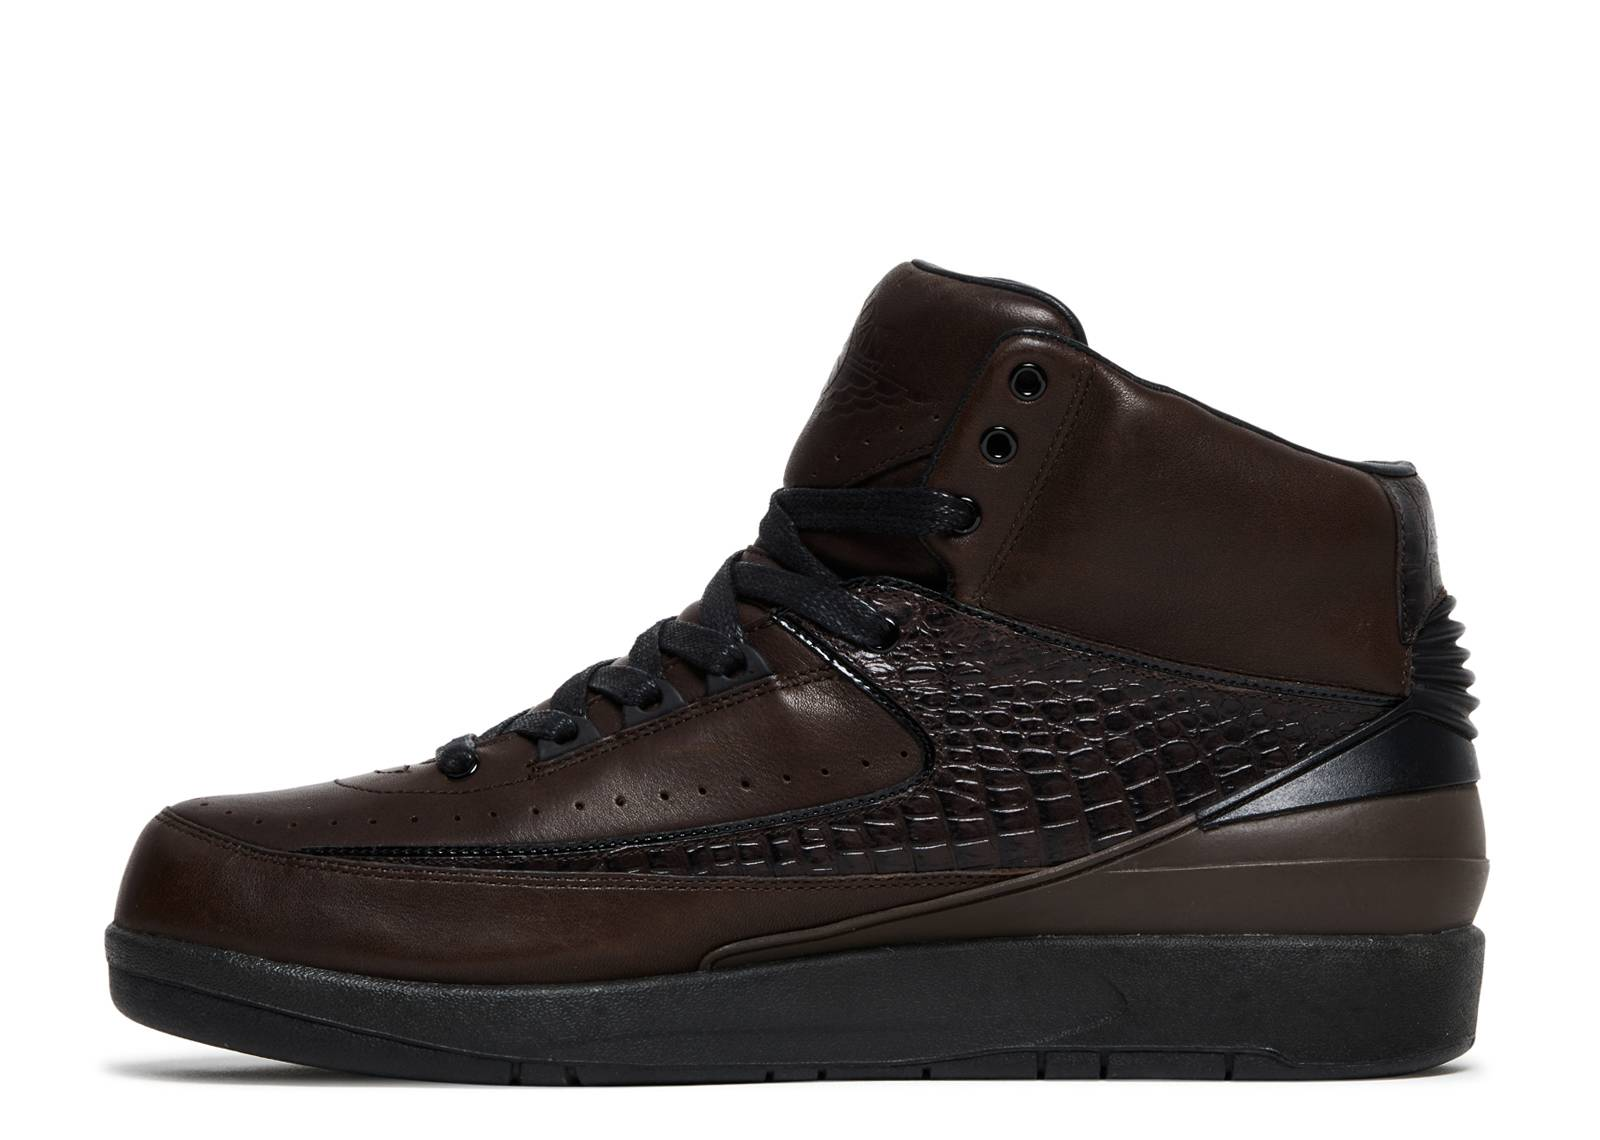 sale retailer bfa88 6210c Air Jordan 2 Retro Premio